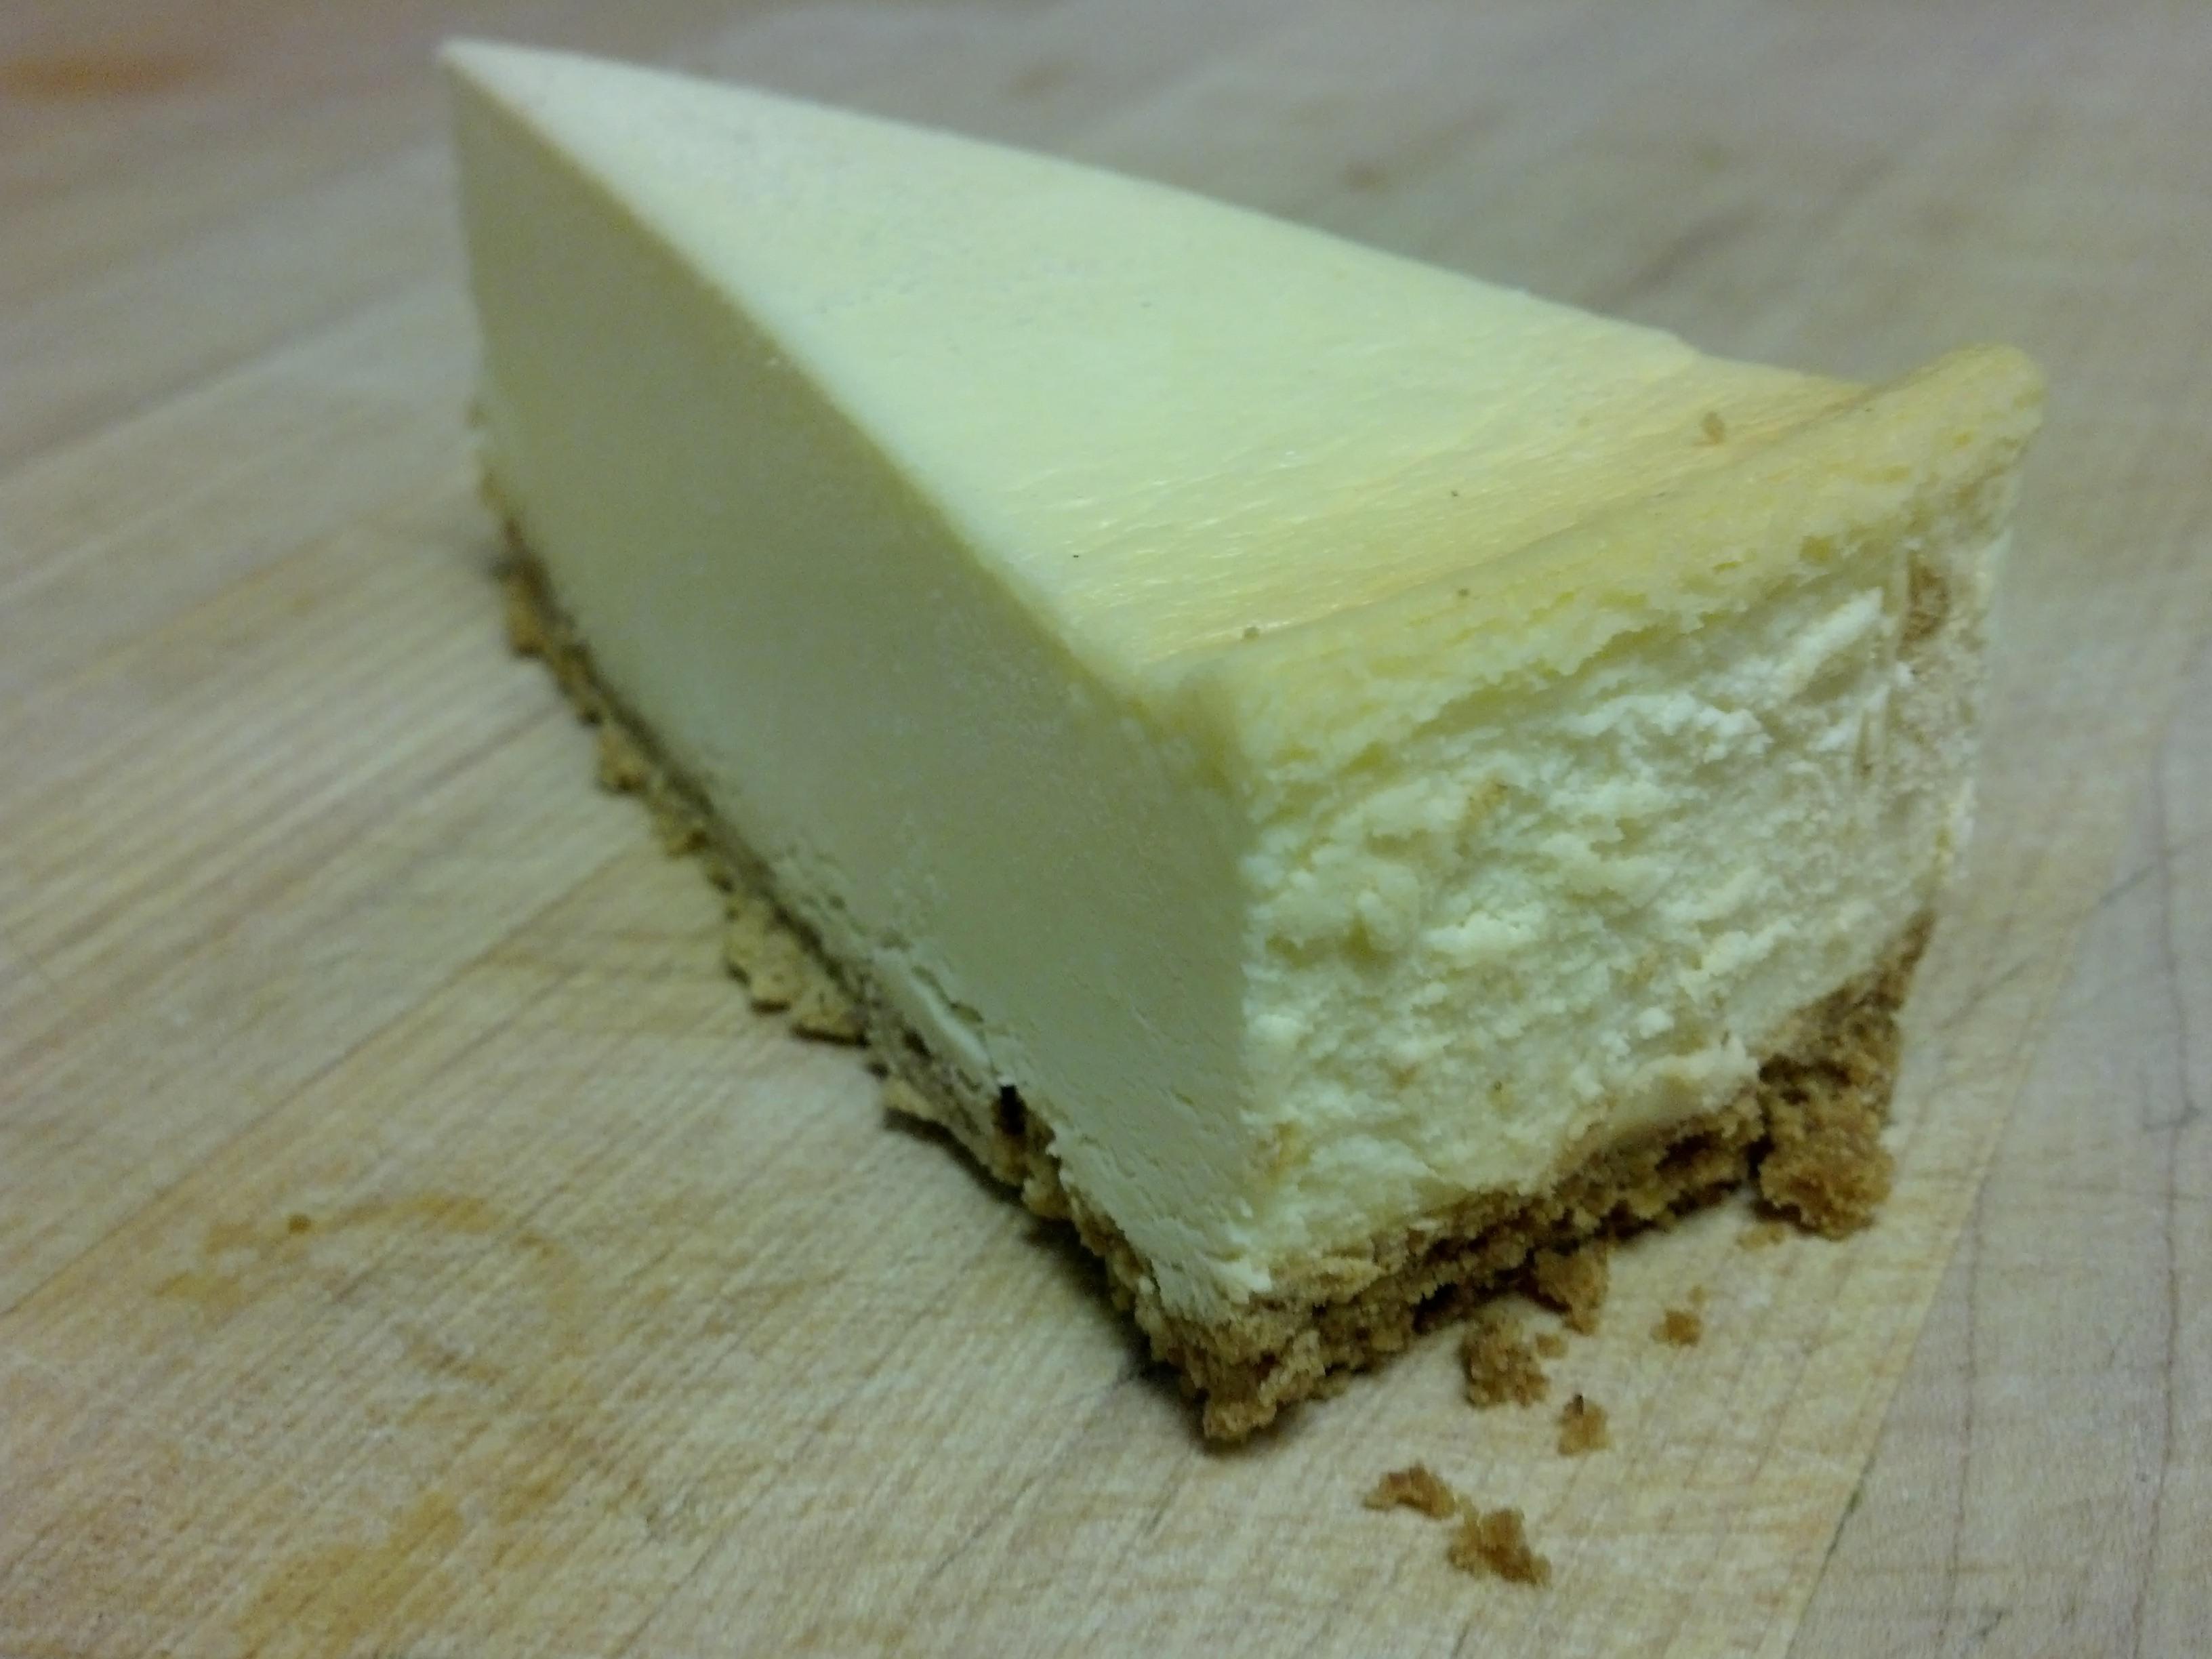 Plain Cheesecake Image